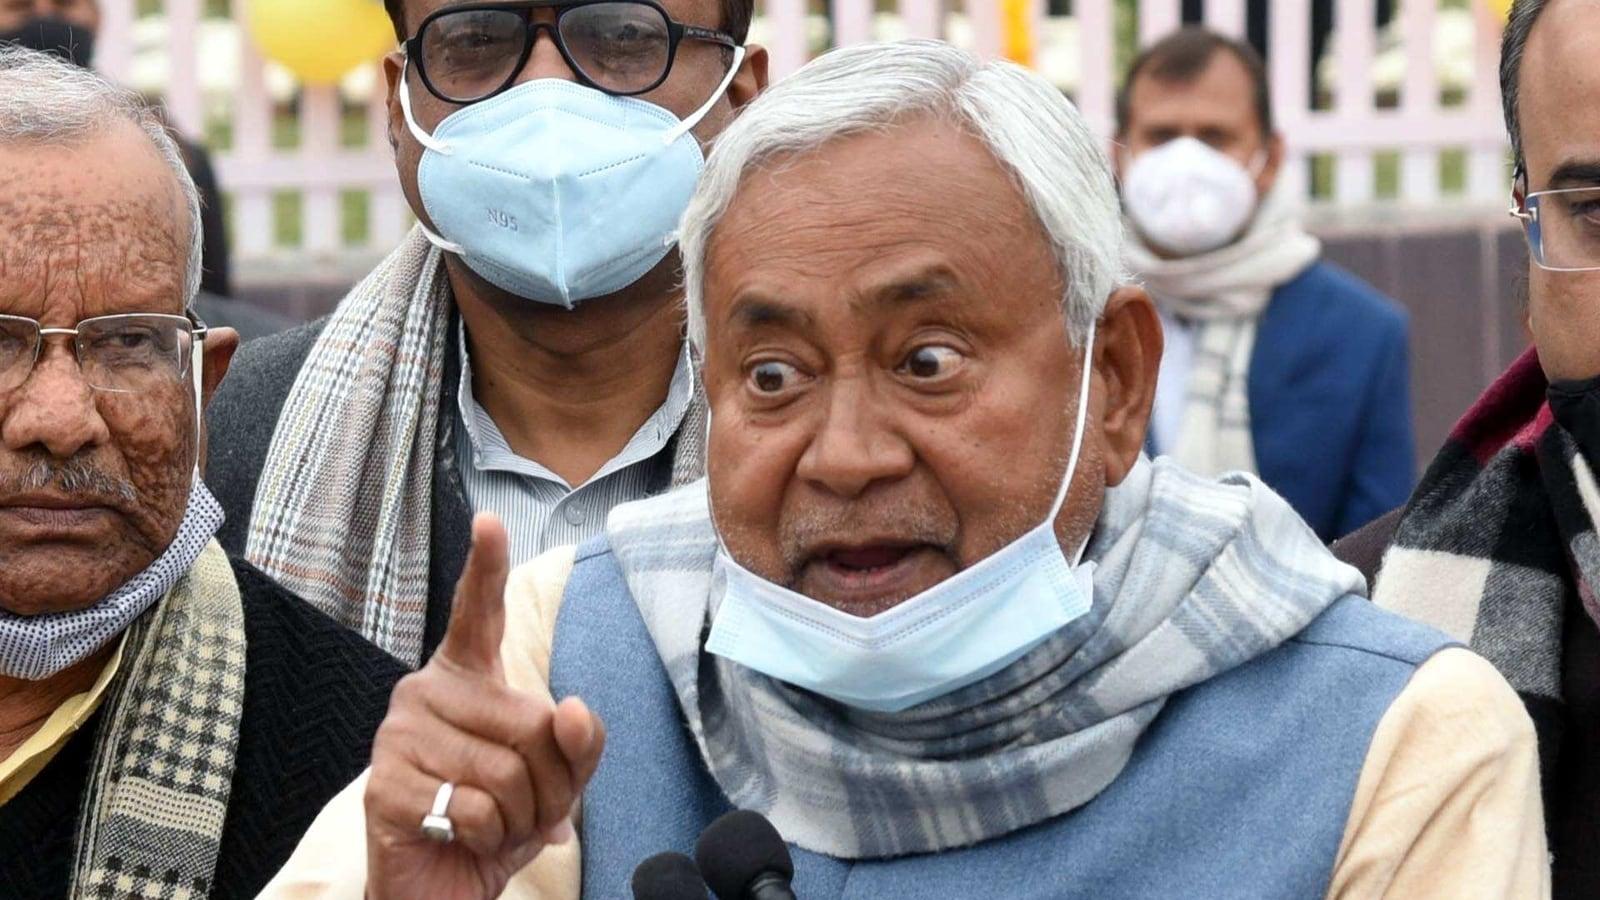 Kya yeh shabd uchit hain?: Bihar CM Nitish Kumar responds to Giriraj Singh's 'beat up govt officials' remark